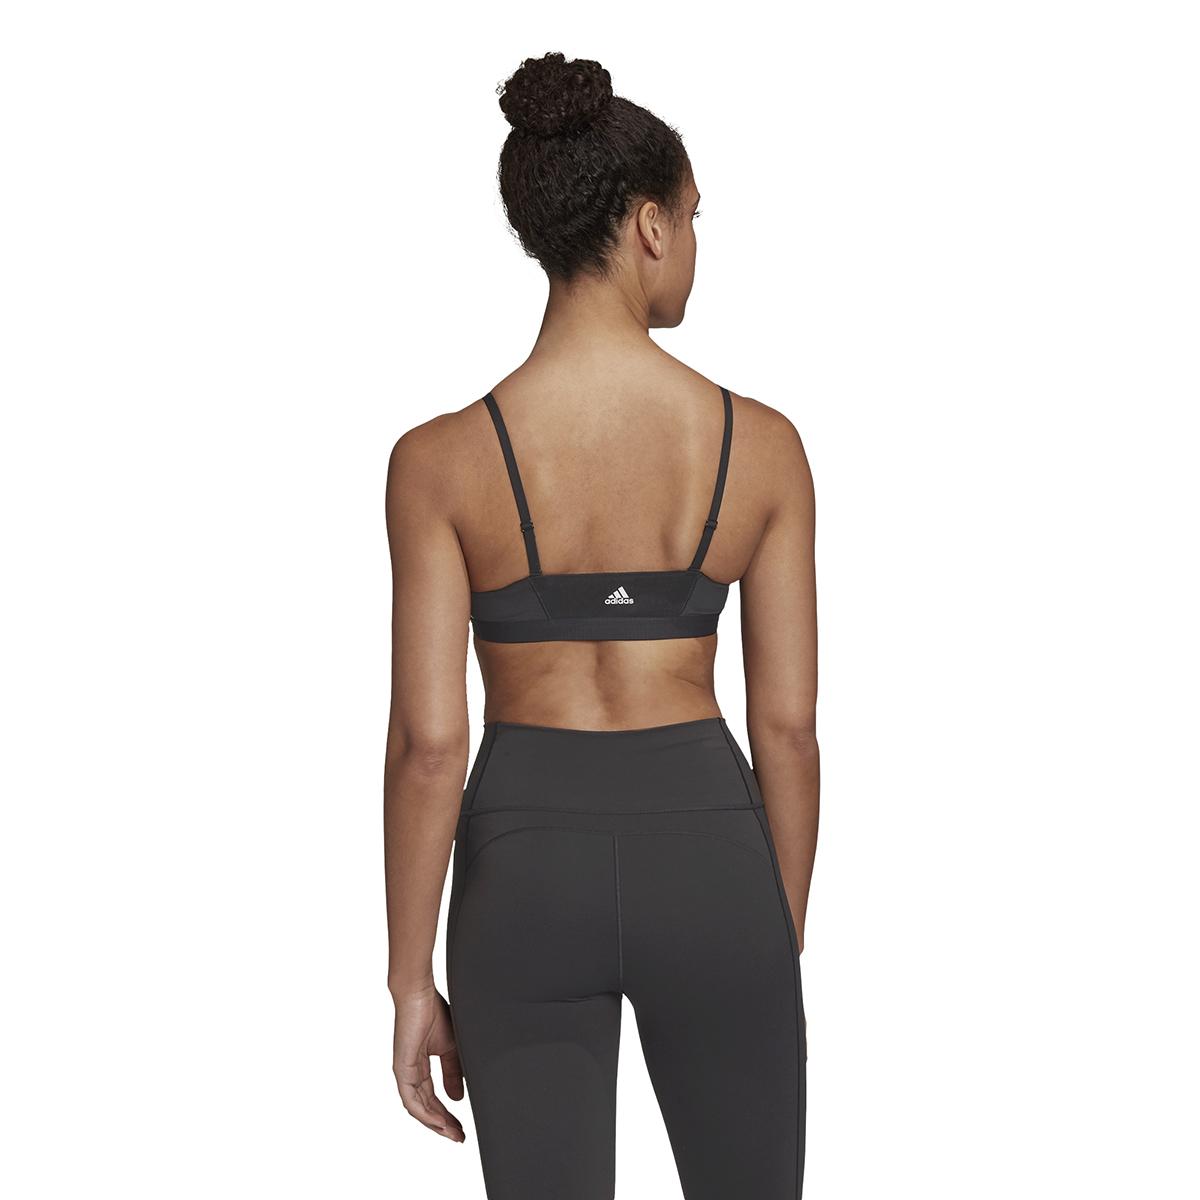 Women's Adidas All Me 3 Stripe Mesh Bra - Color: Black - Size: XXS, Black, large, image 2